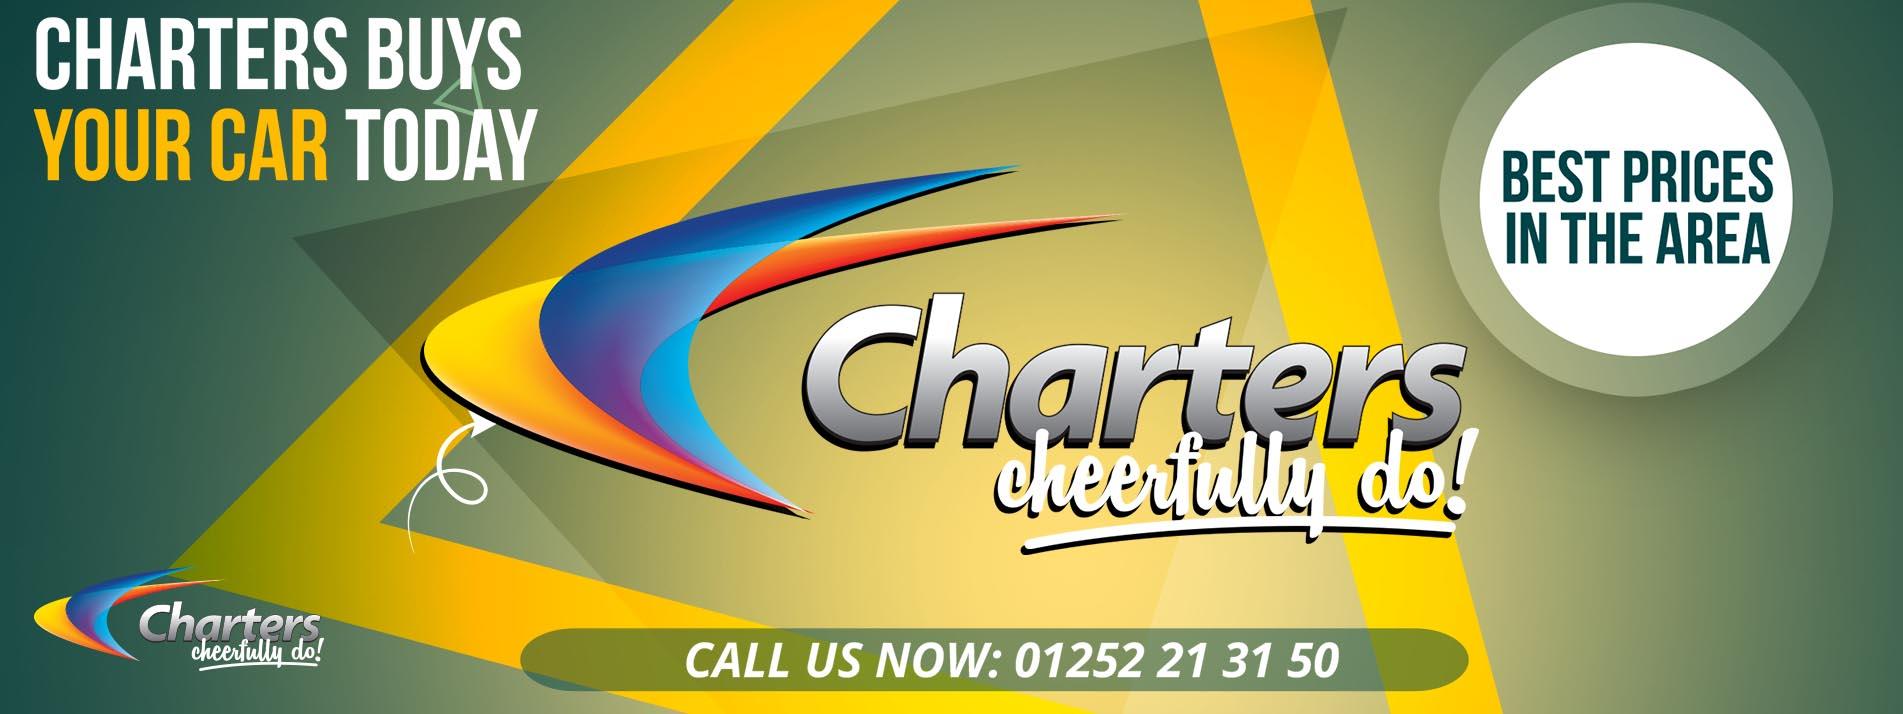 charters-citroen-buys-any-car-today-c-m-sli